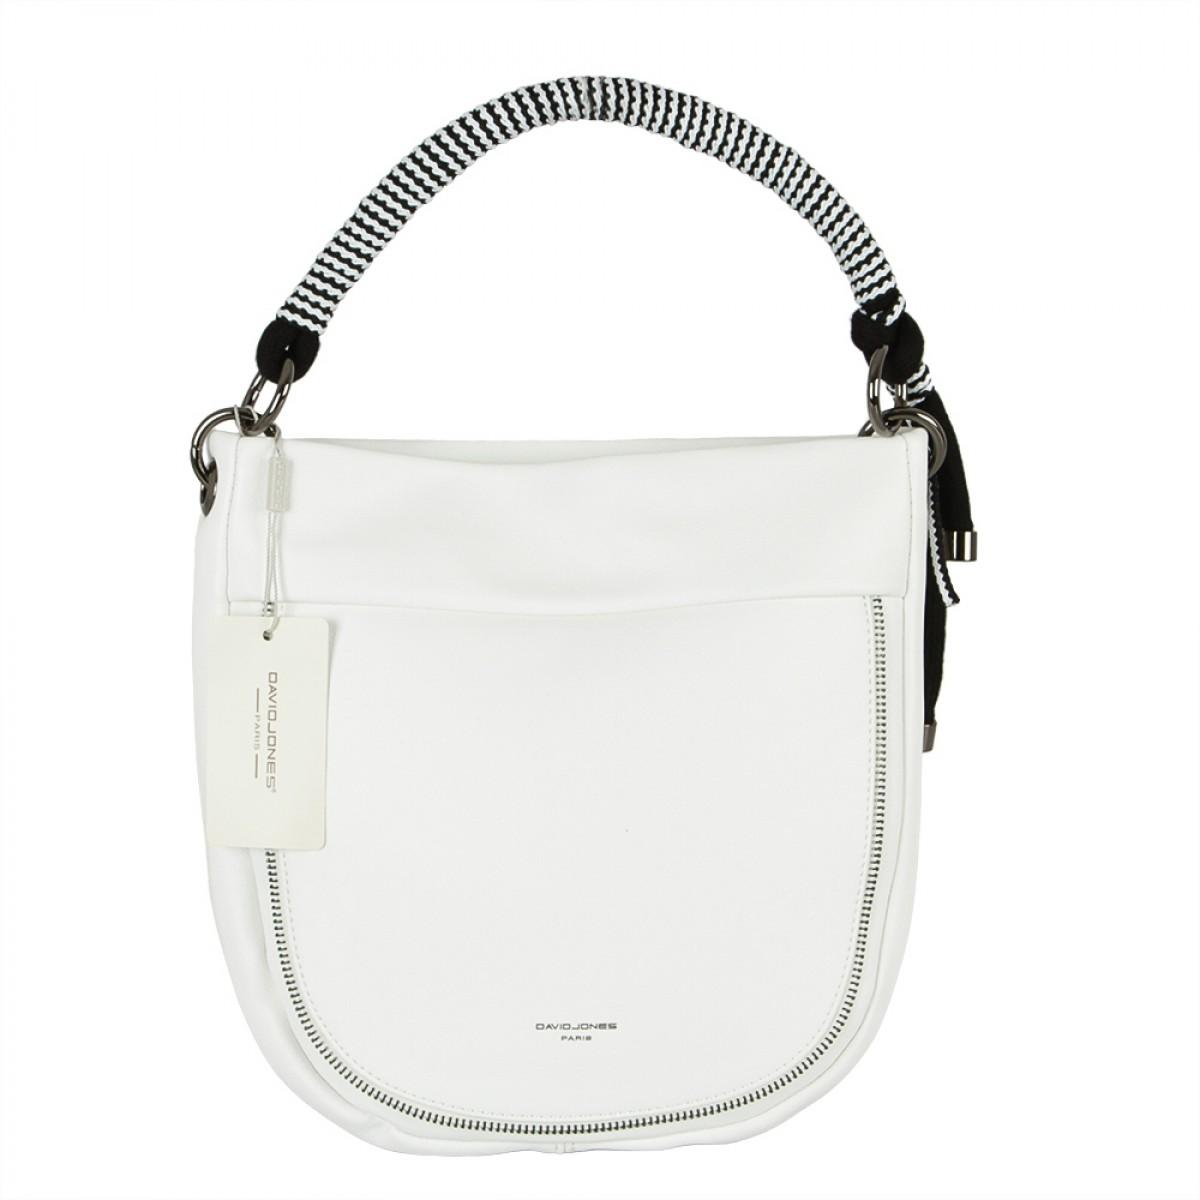 Жіноча сумка David Jones CM5736 WHITE